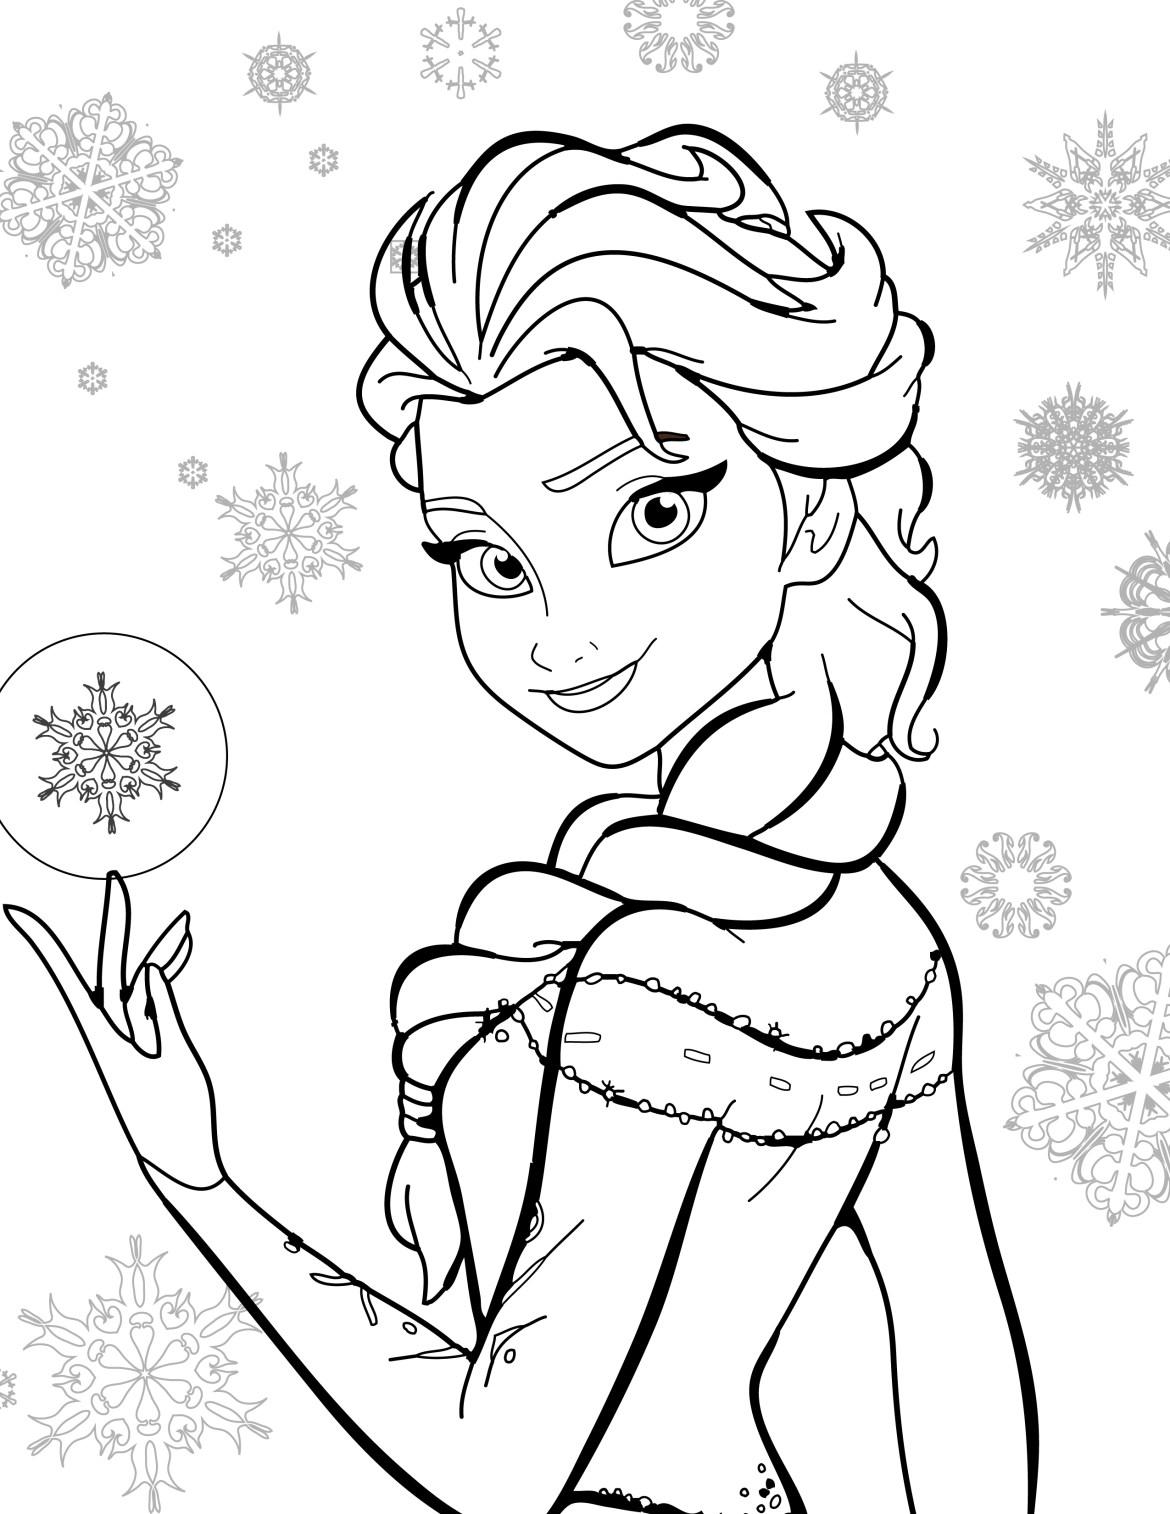 Coloriage De Disney Gratuit Elsa Frozen Artherapie Ca